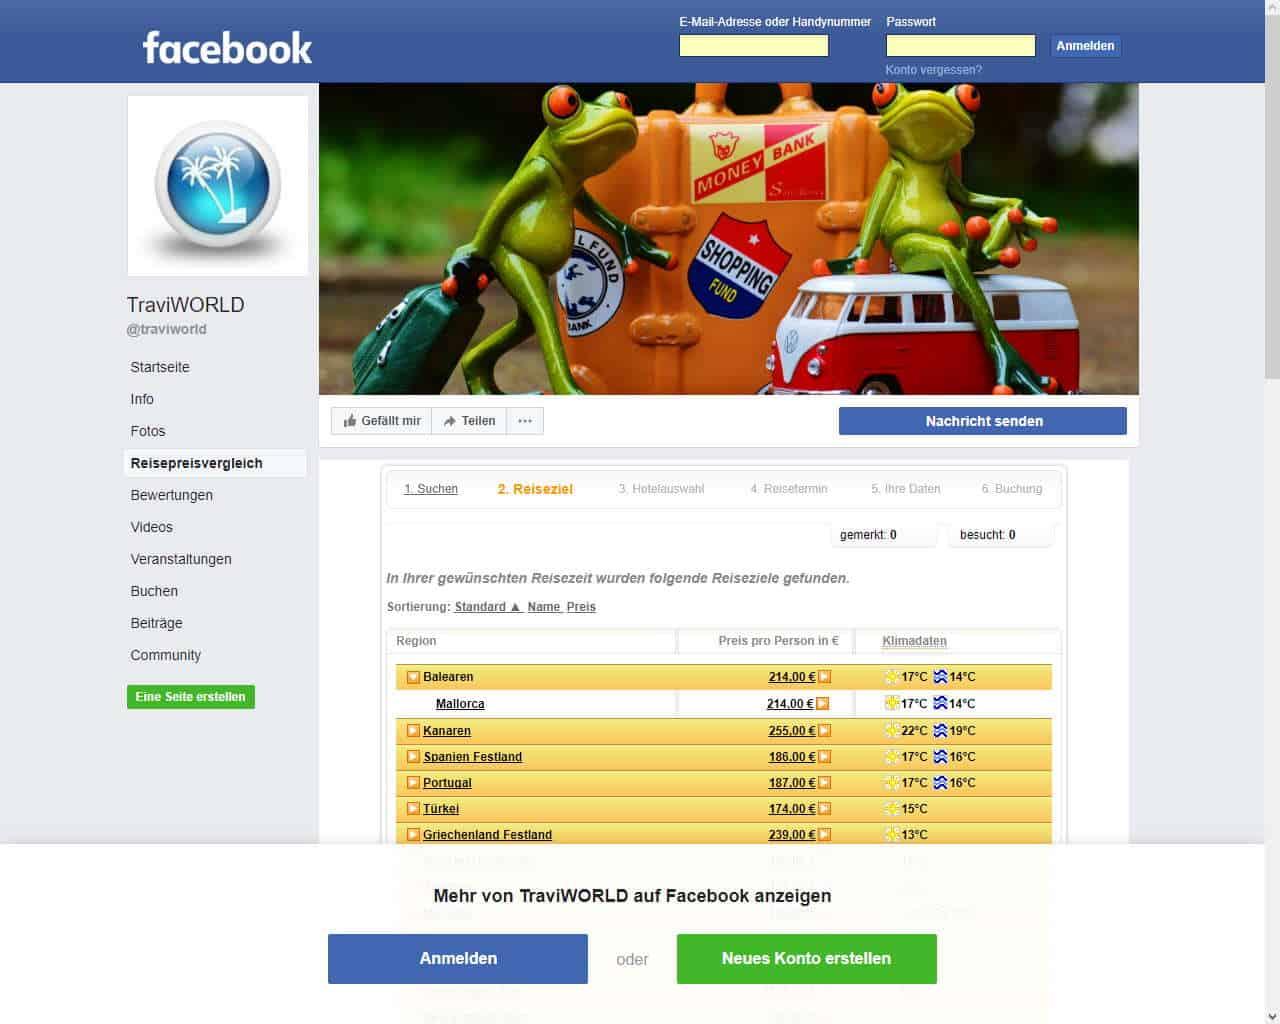 Reisebuchung auf Facebook